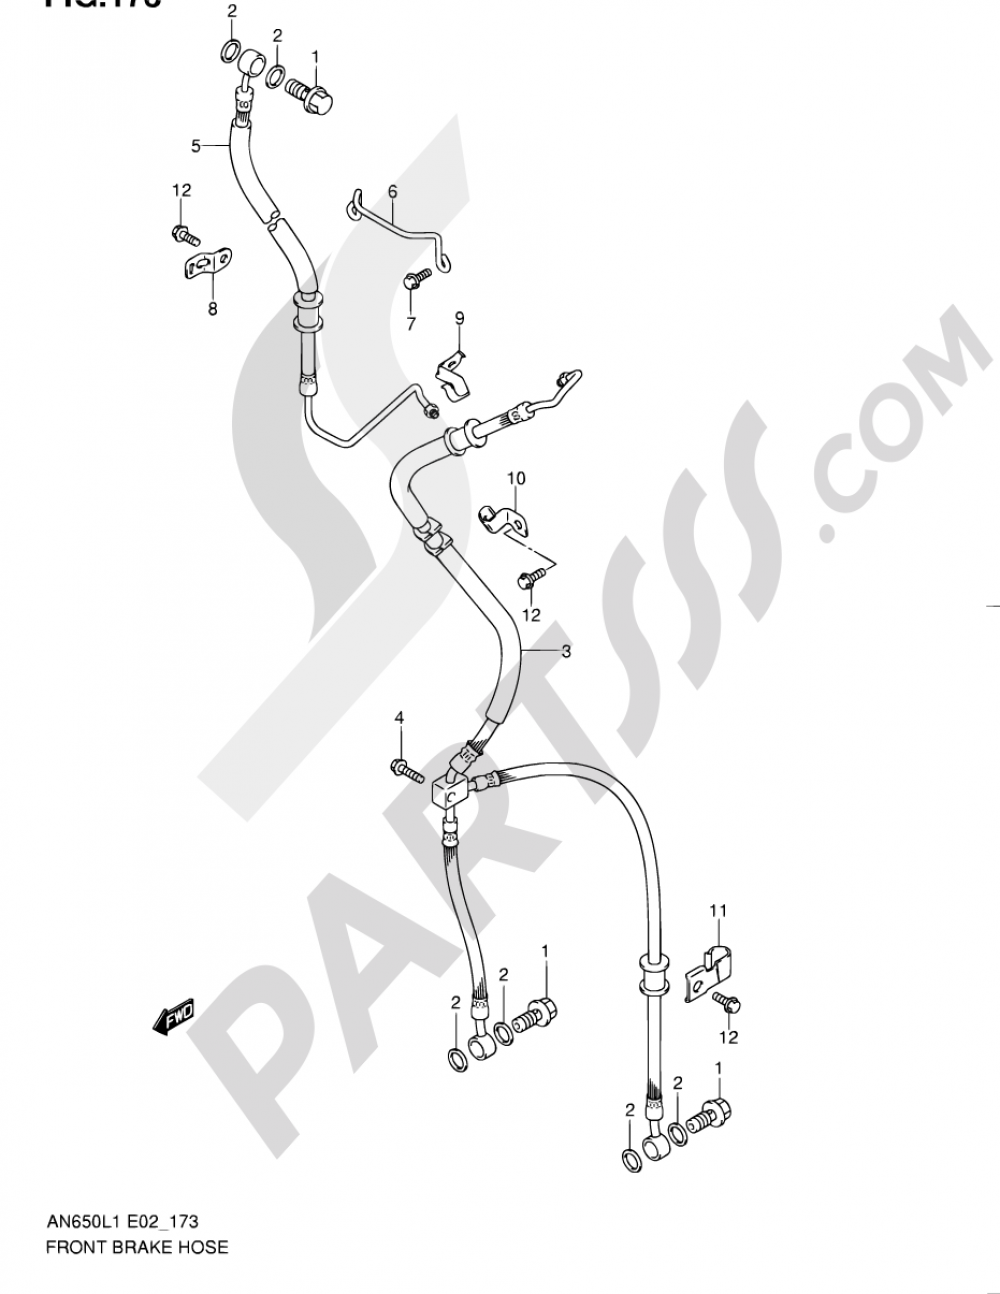 173 - FRONT BRAKE HOSE (AN650AL1 E19) Suzuki BURGMAN AN650 2011